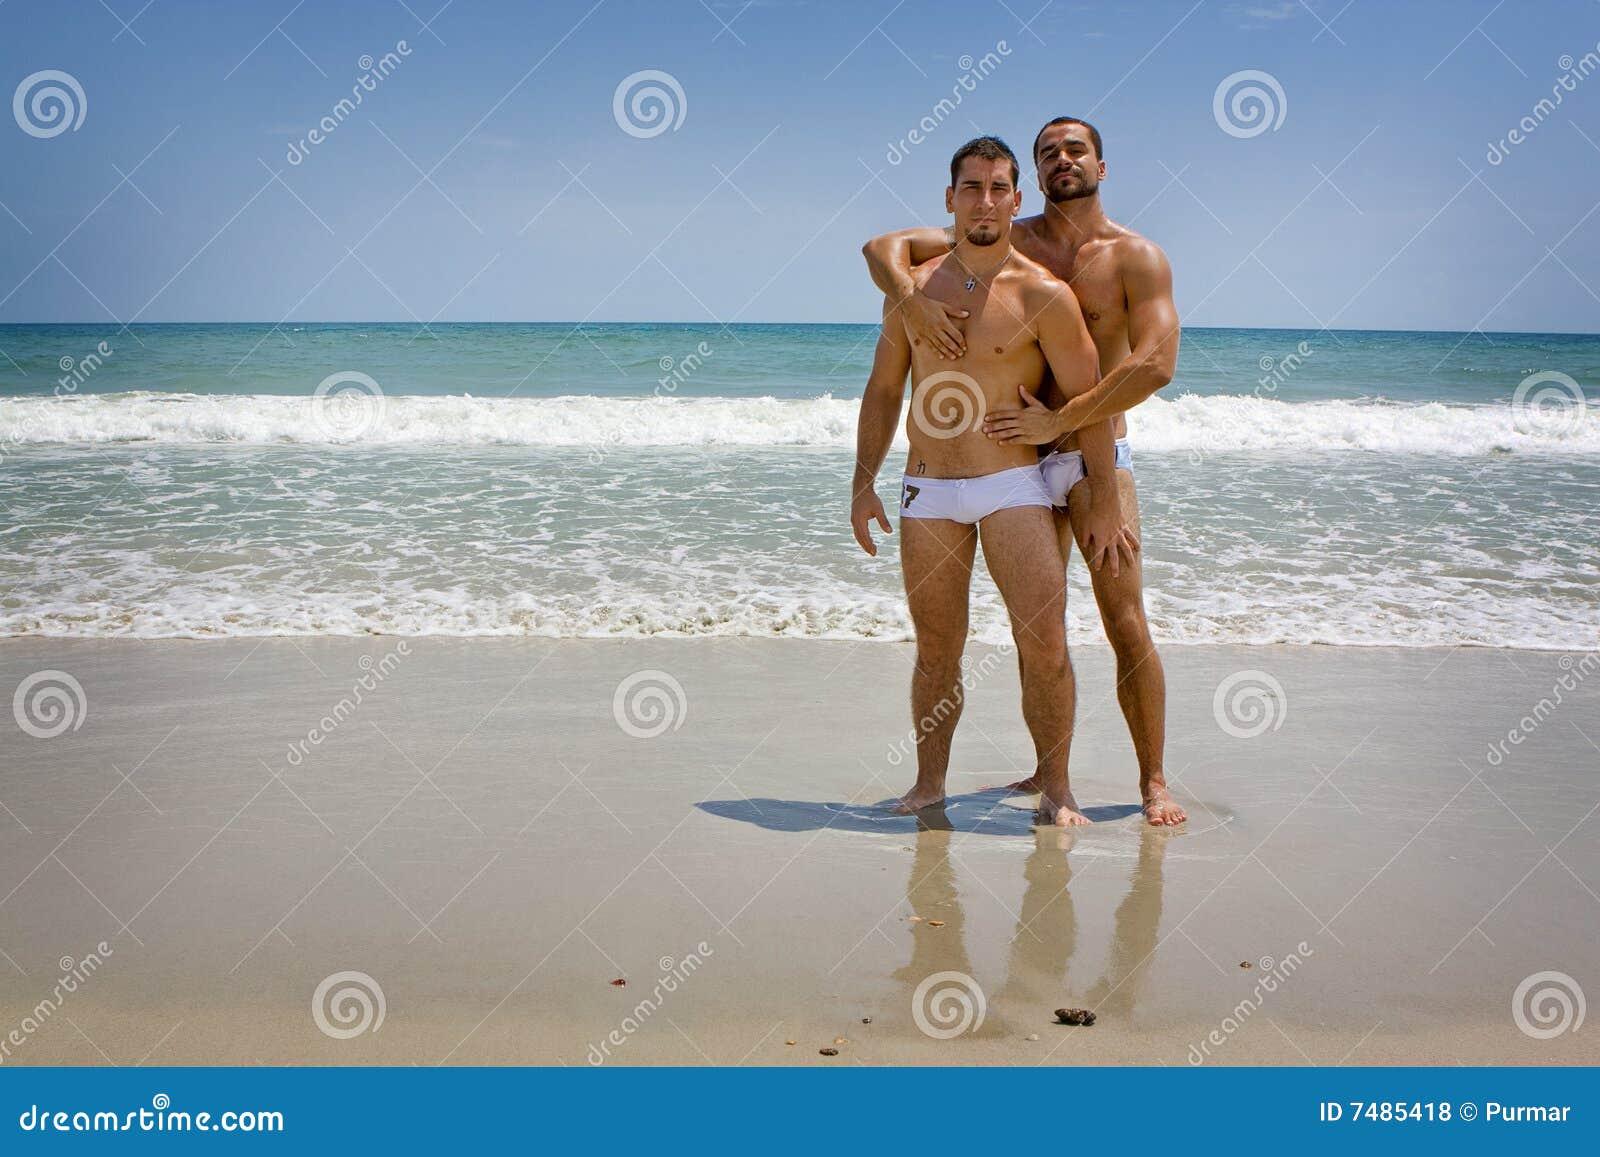 free gay man photos